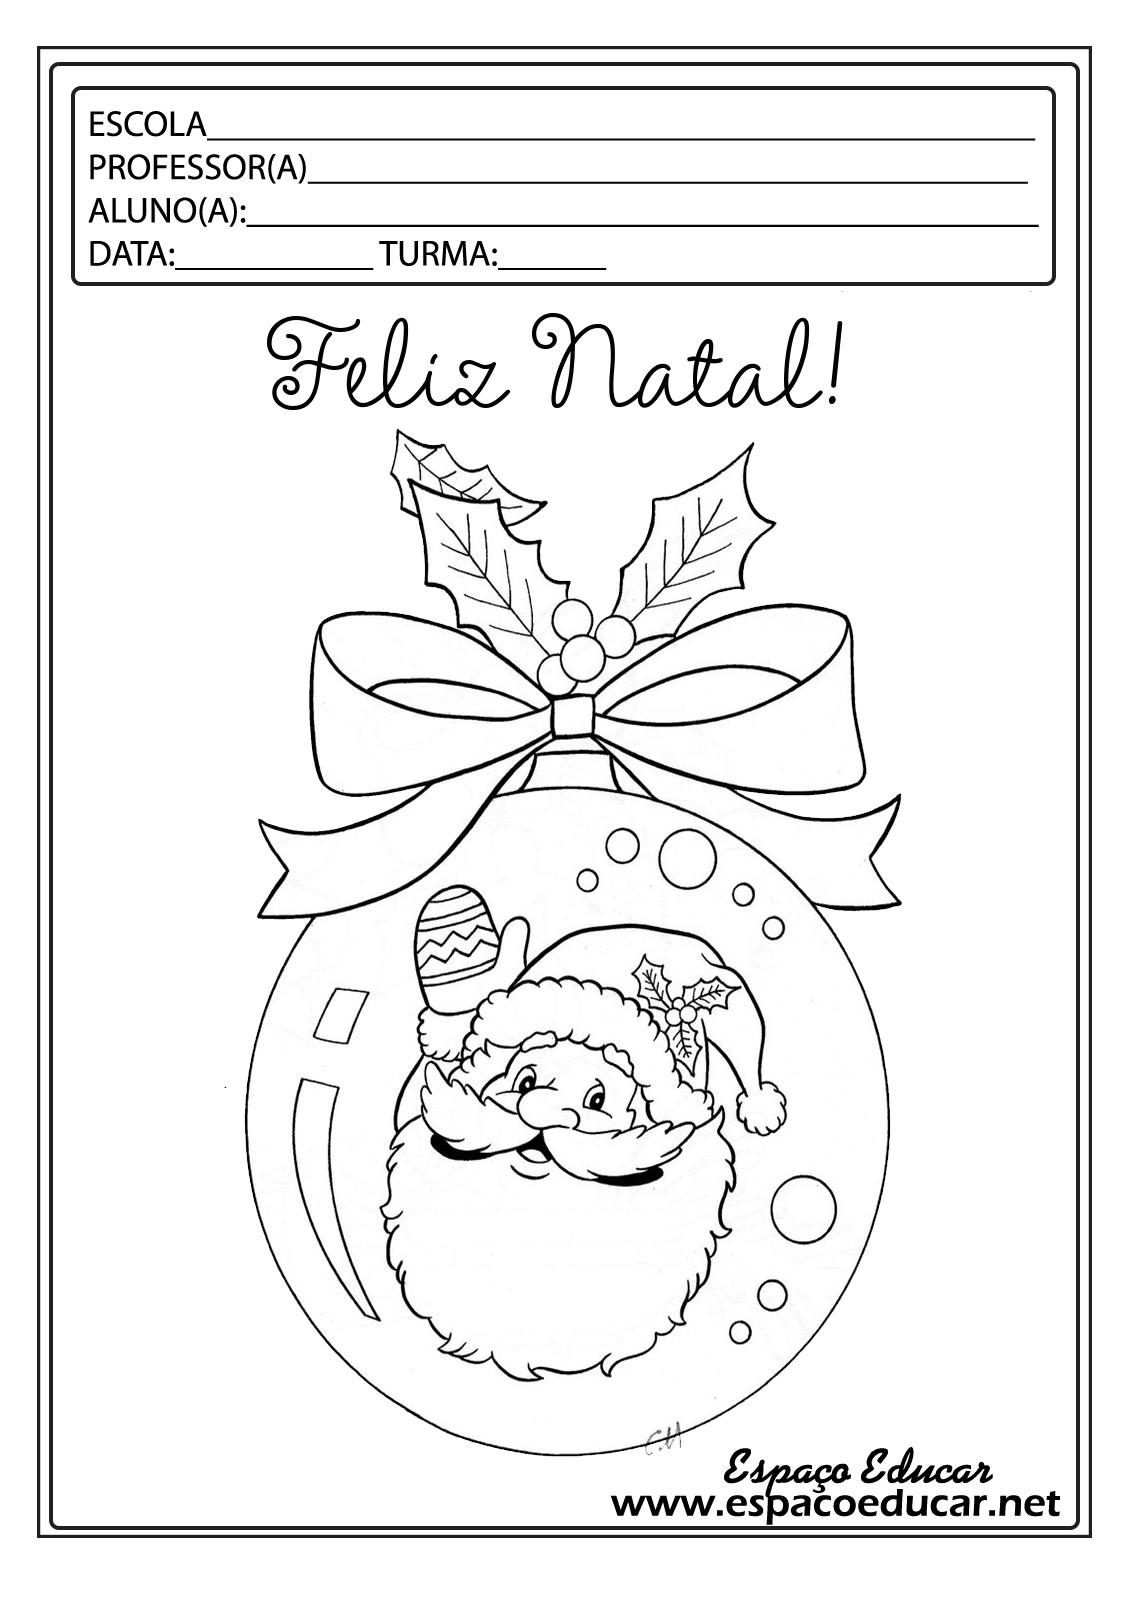 Lindos Desenhos De Natal Para Colorir Pintar Imprimir